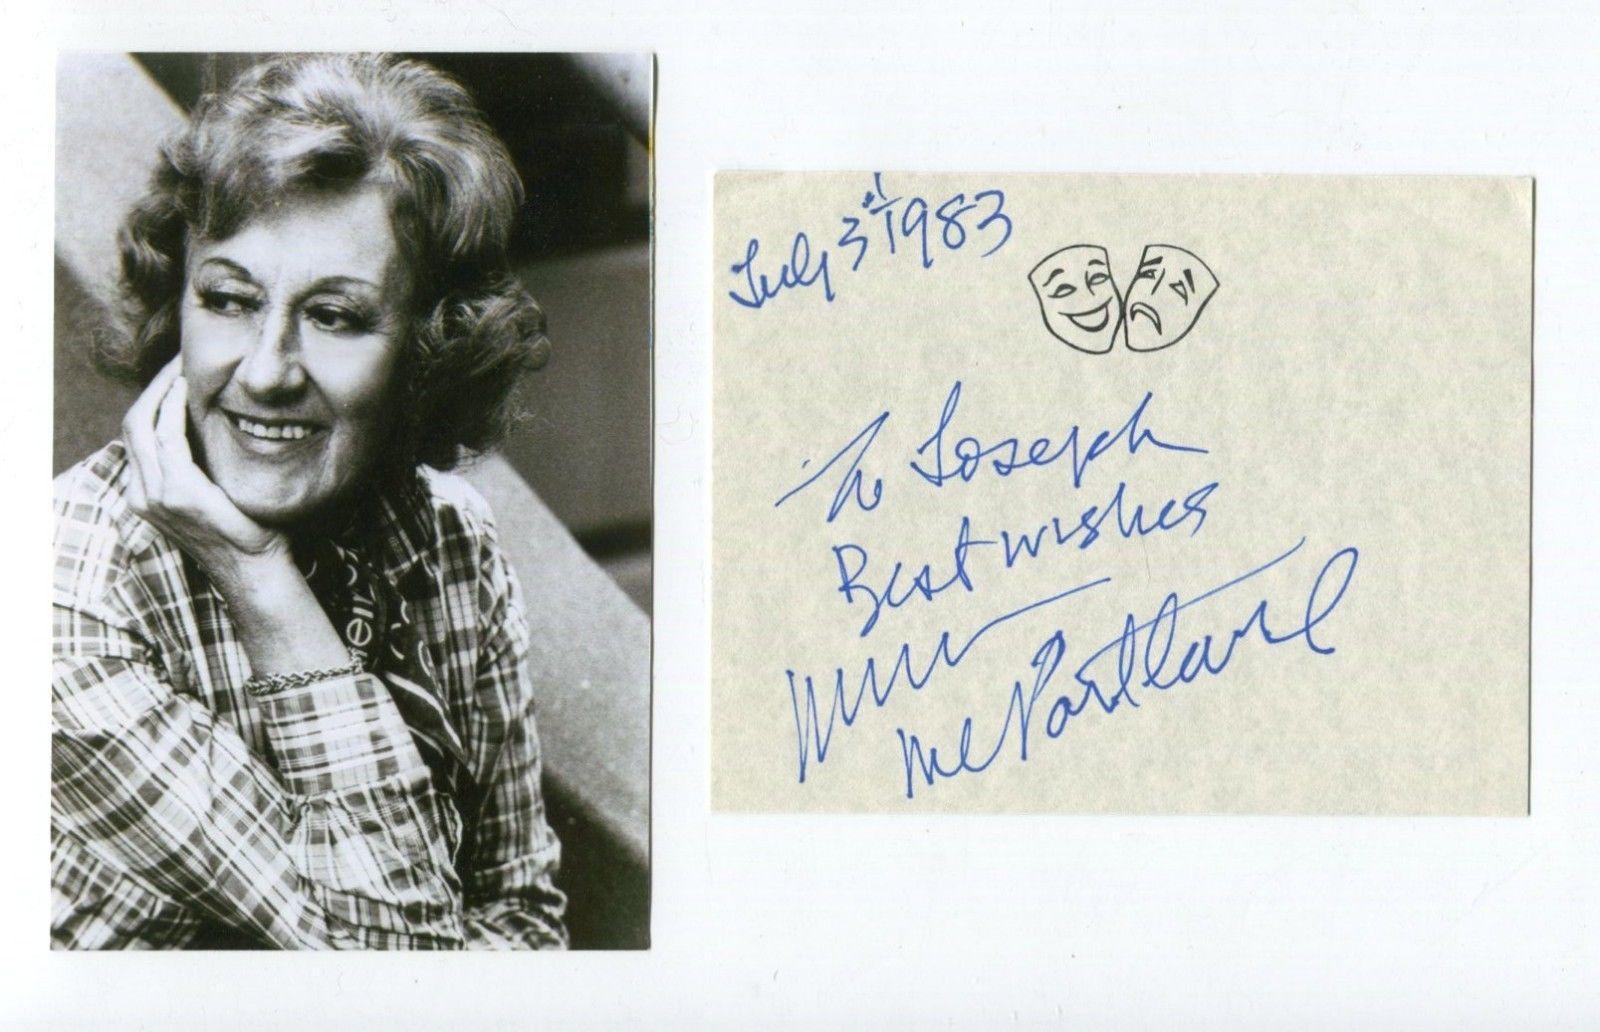 Marian McPartland Jazz Big Band Singer Signed Autograph w/ Photo